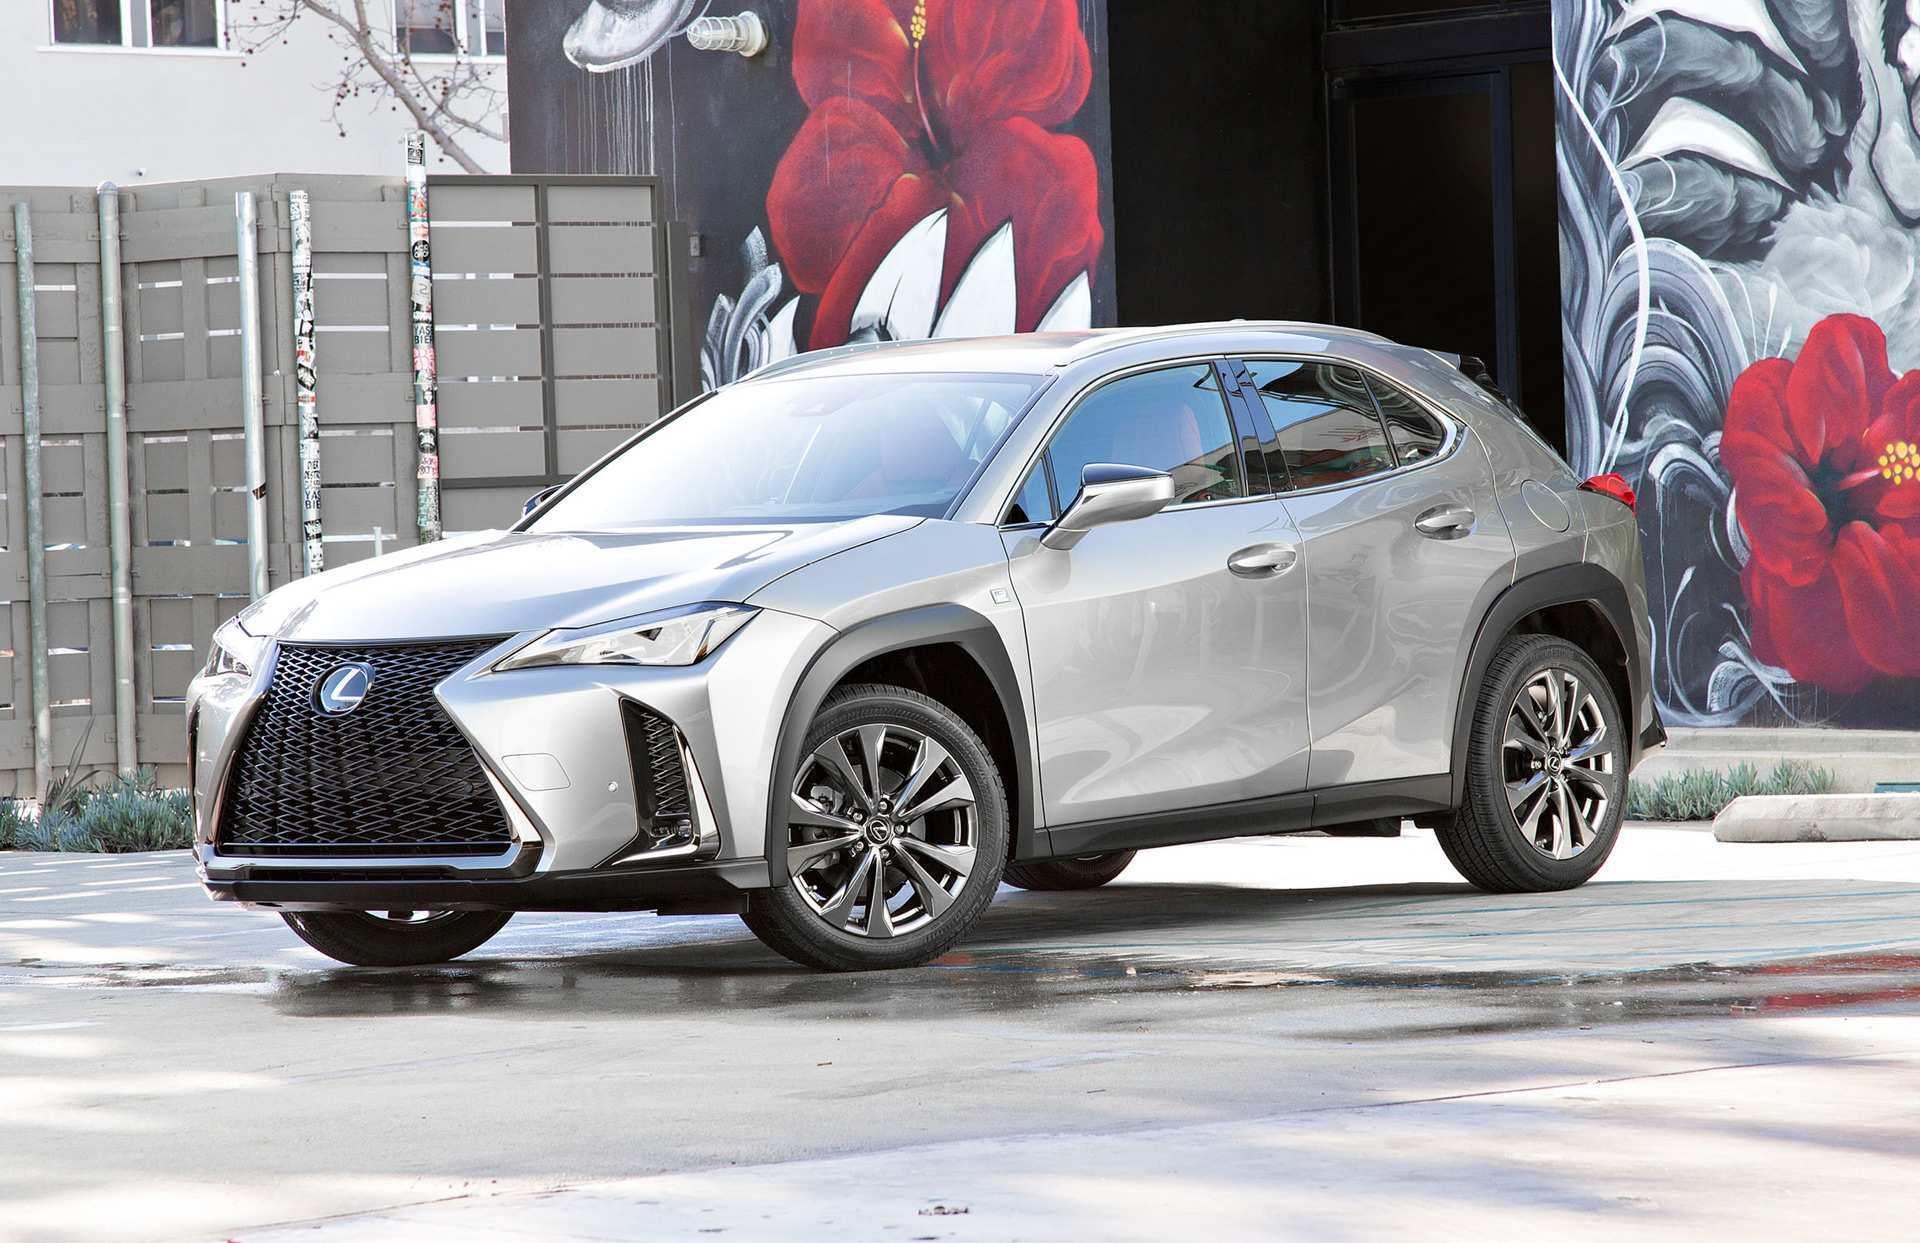 63 All New 2020 Lexus Ux Hybrid Redesign by 2020 Lexus Ux Hybrid